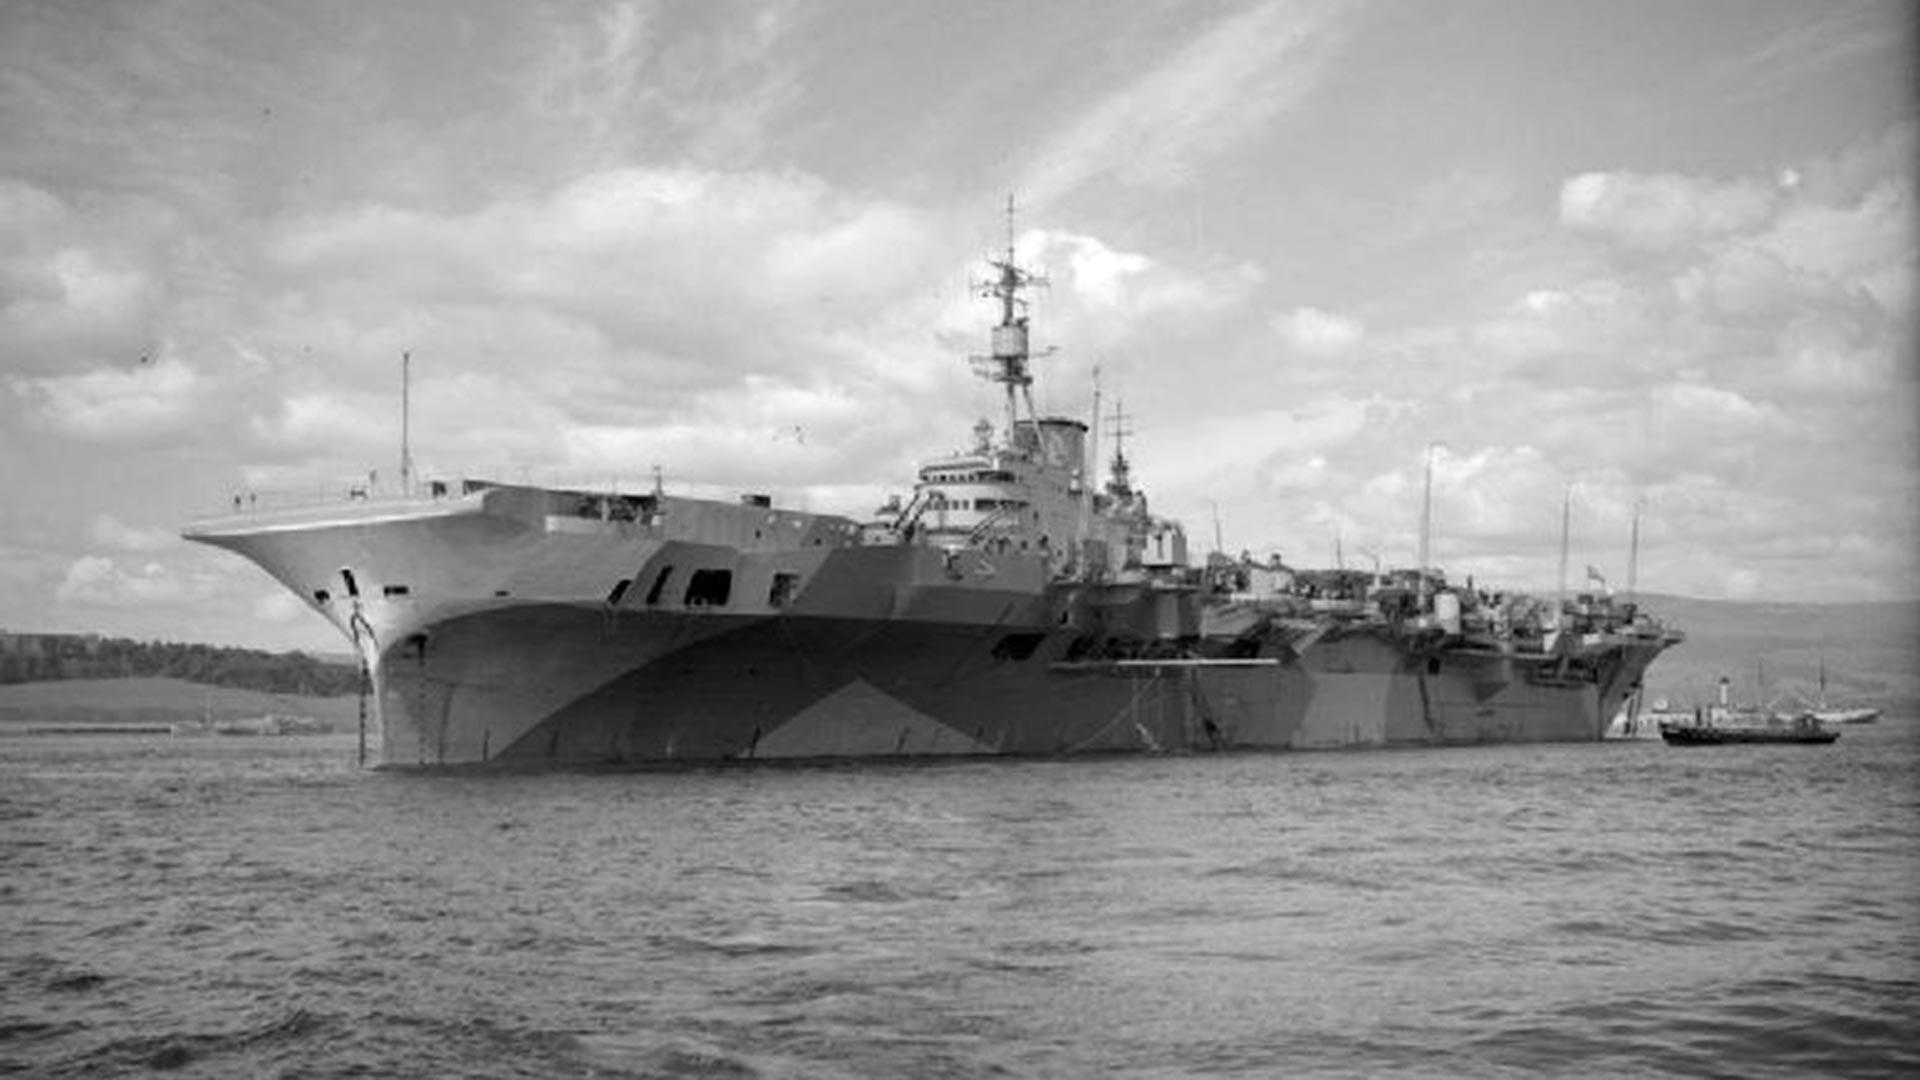 Letalonosilka HMS Implacable